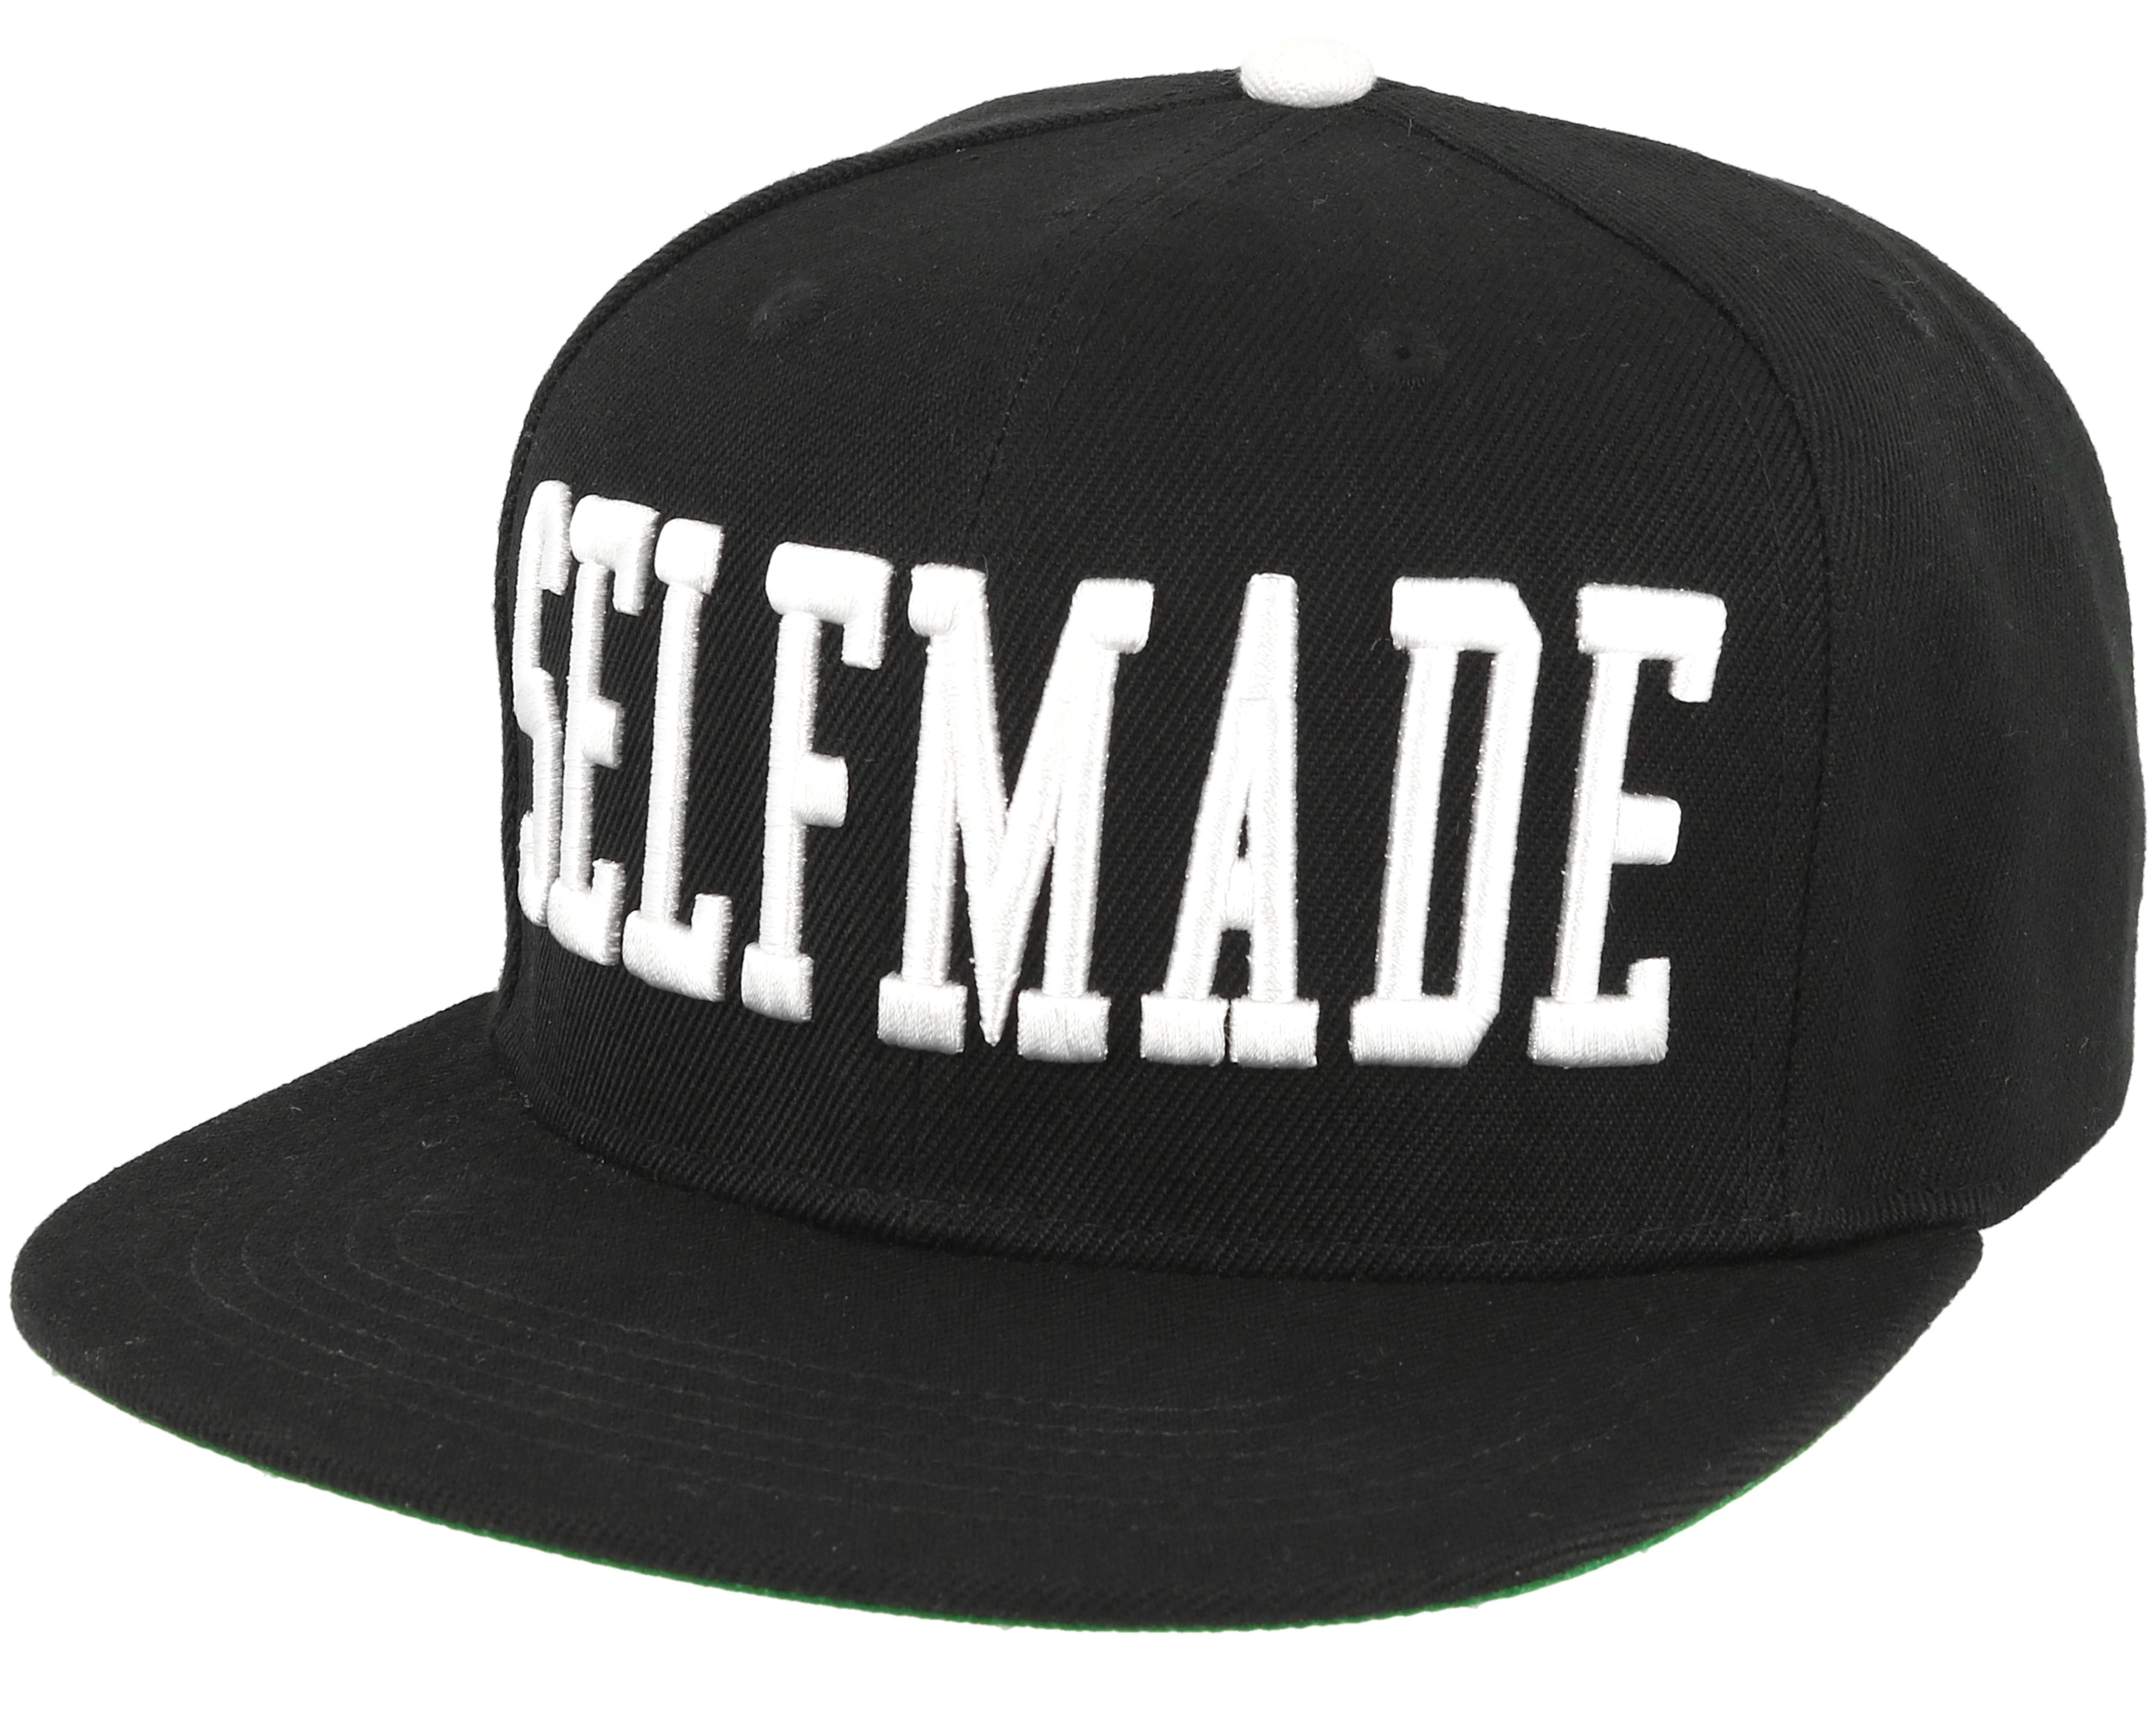 Selfmade Black White Snapback - Galagowear caps  0429e7b659e